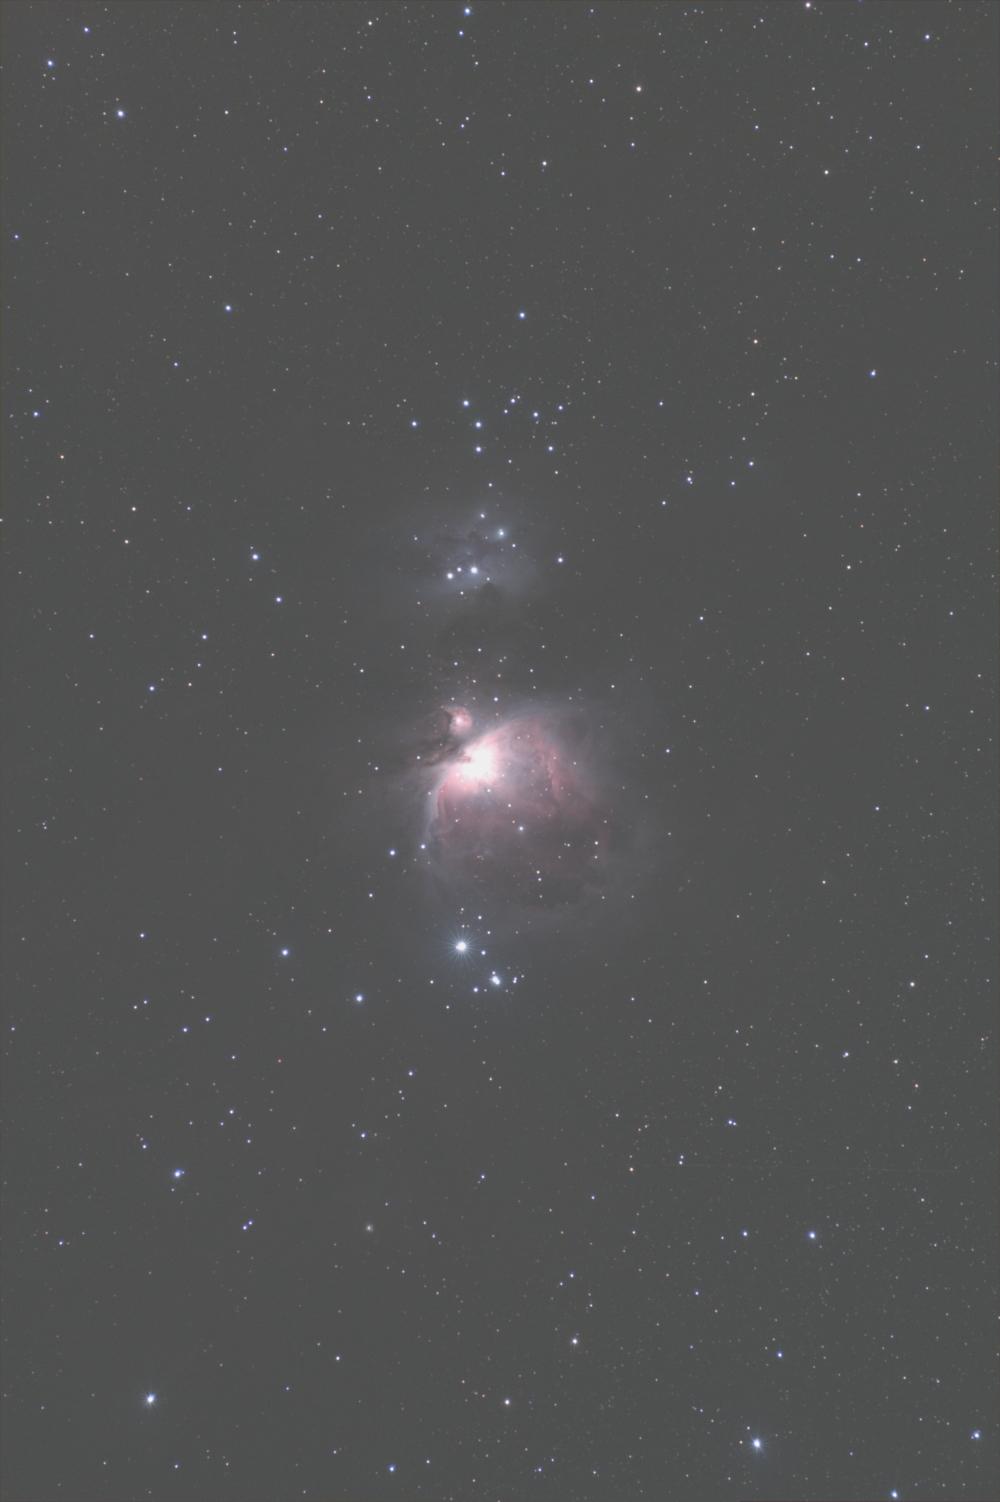 f:id:snct-astro:20171129125129j:plain